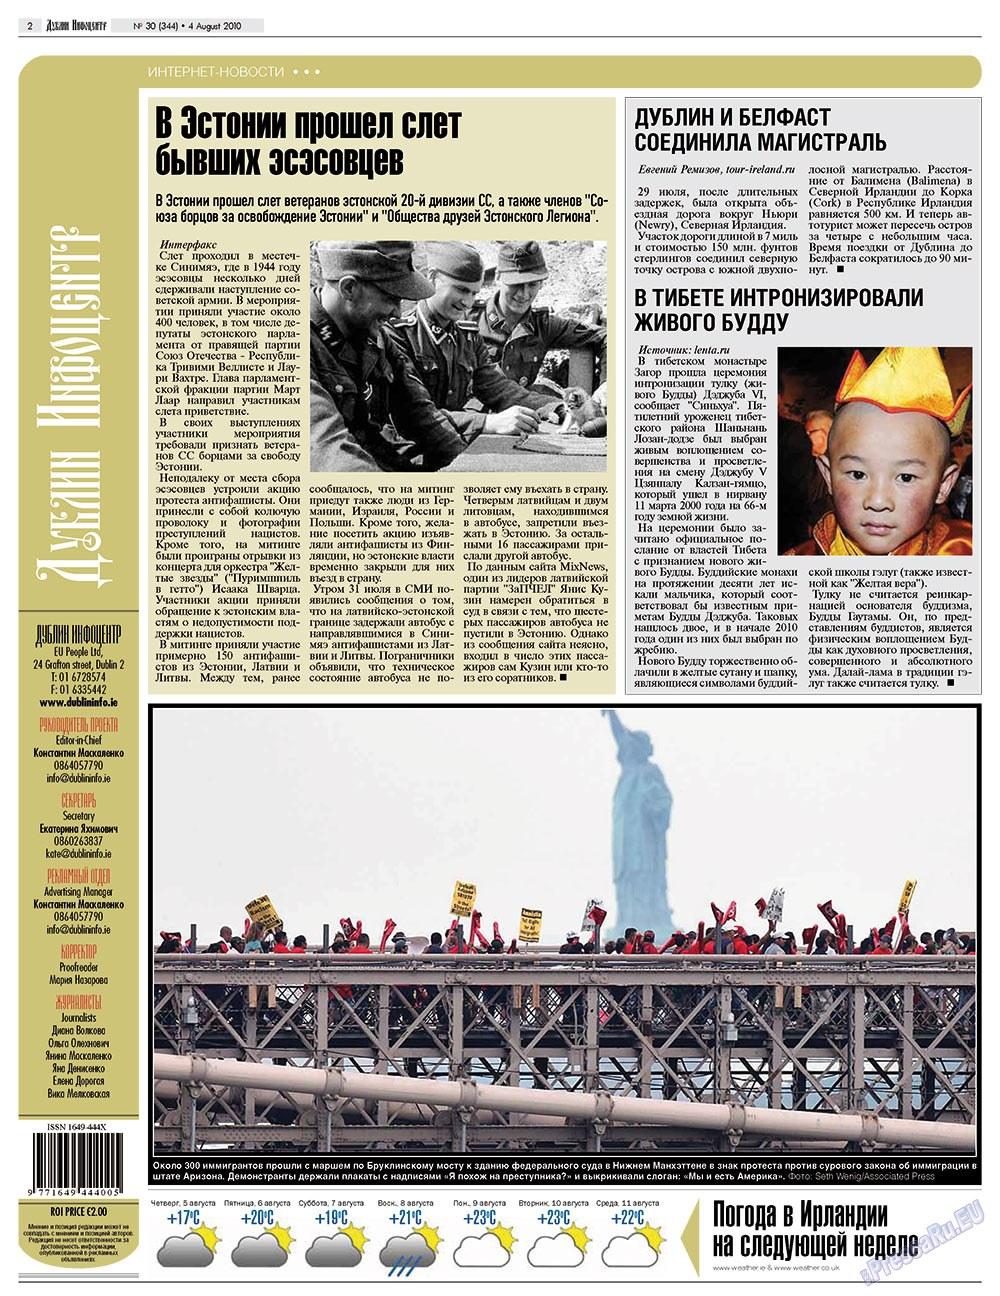 Дублин инфоцентр (газета). 2010 год, номер 30, стр. 2